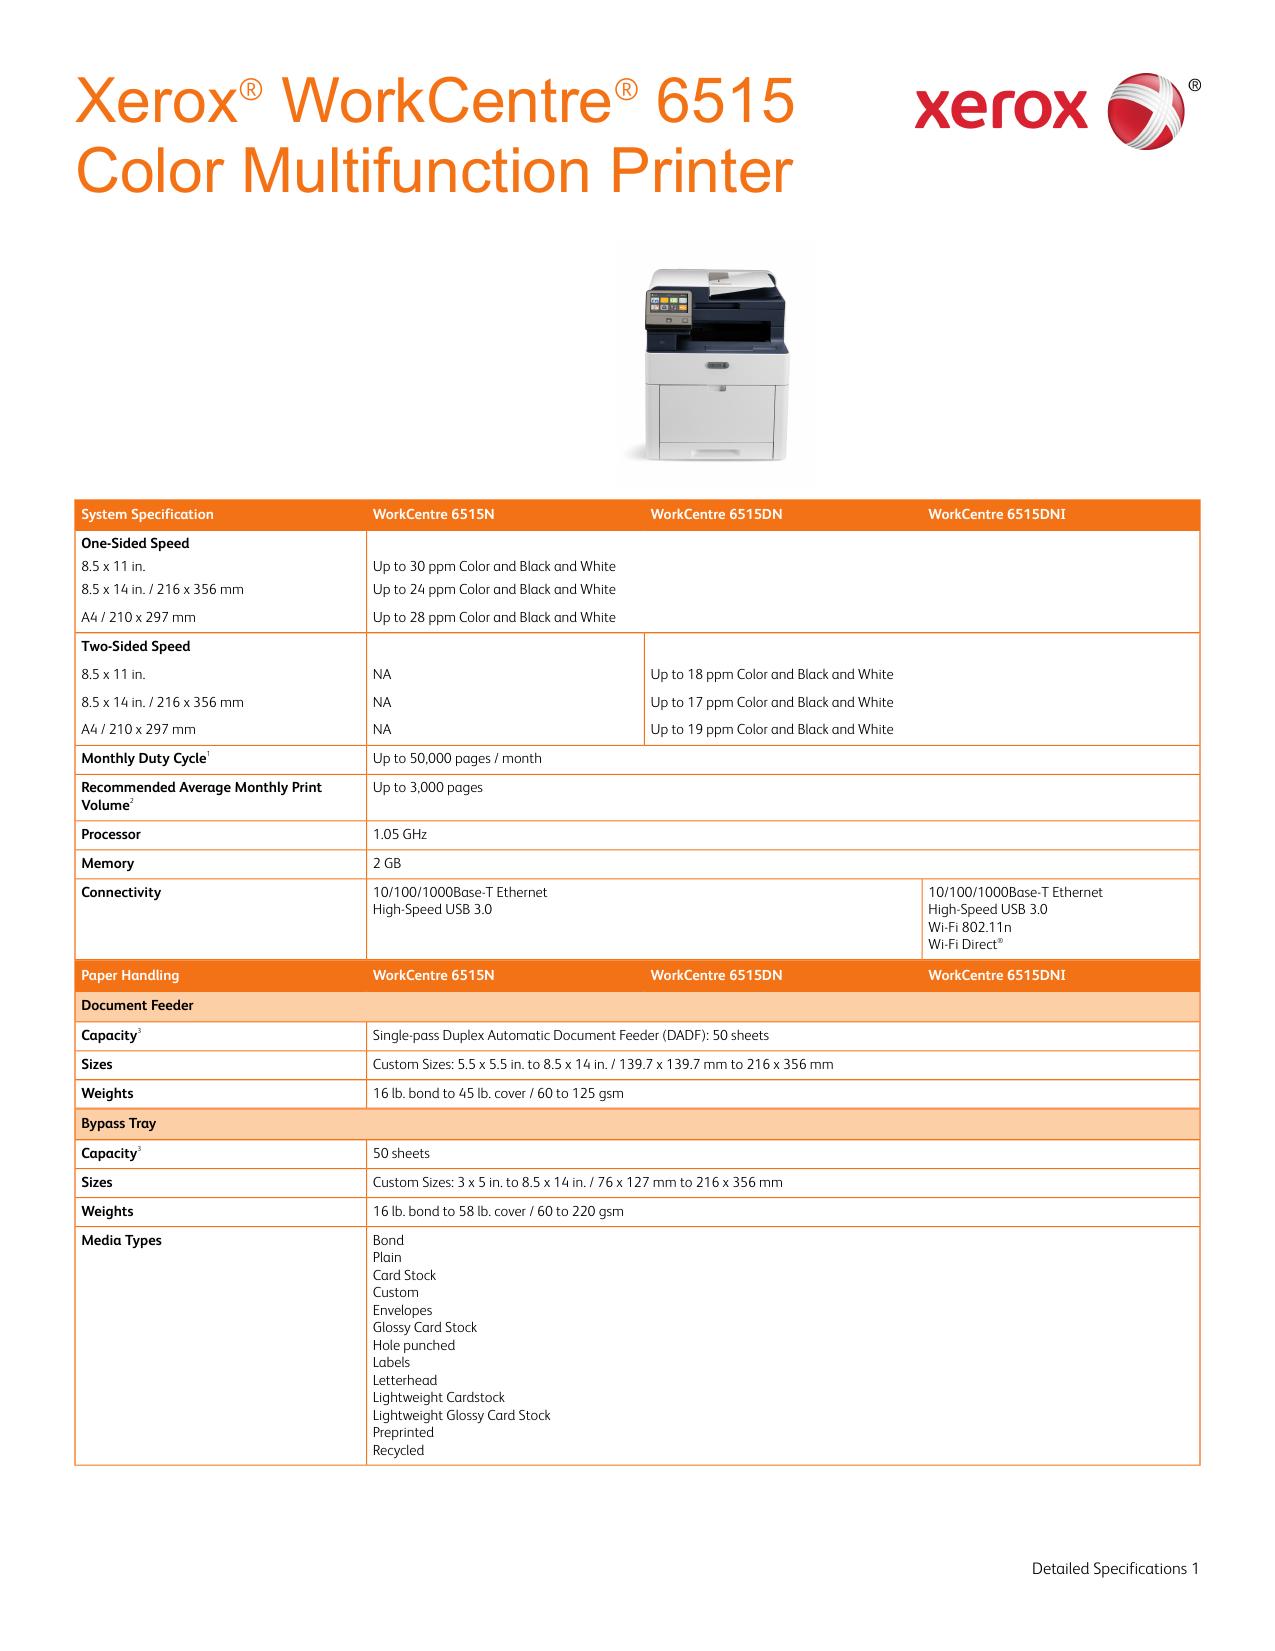 Xerox® WorkCentre® 6515 Color Multifunction Printer